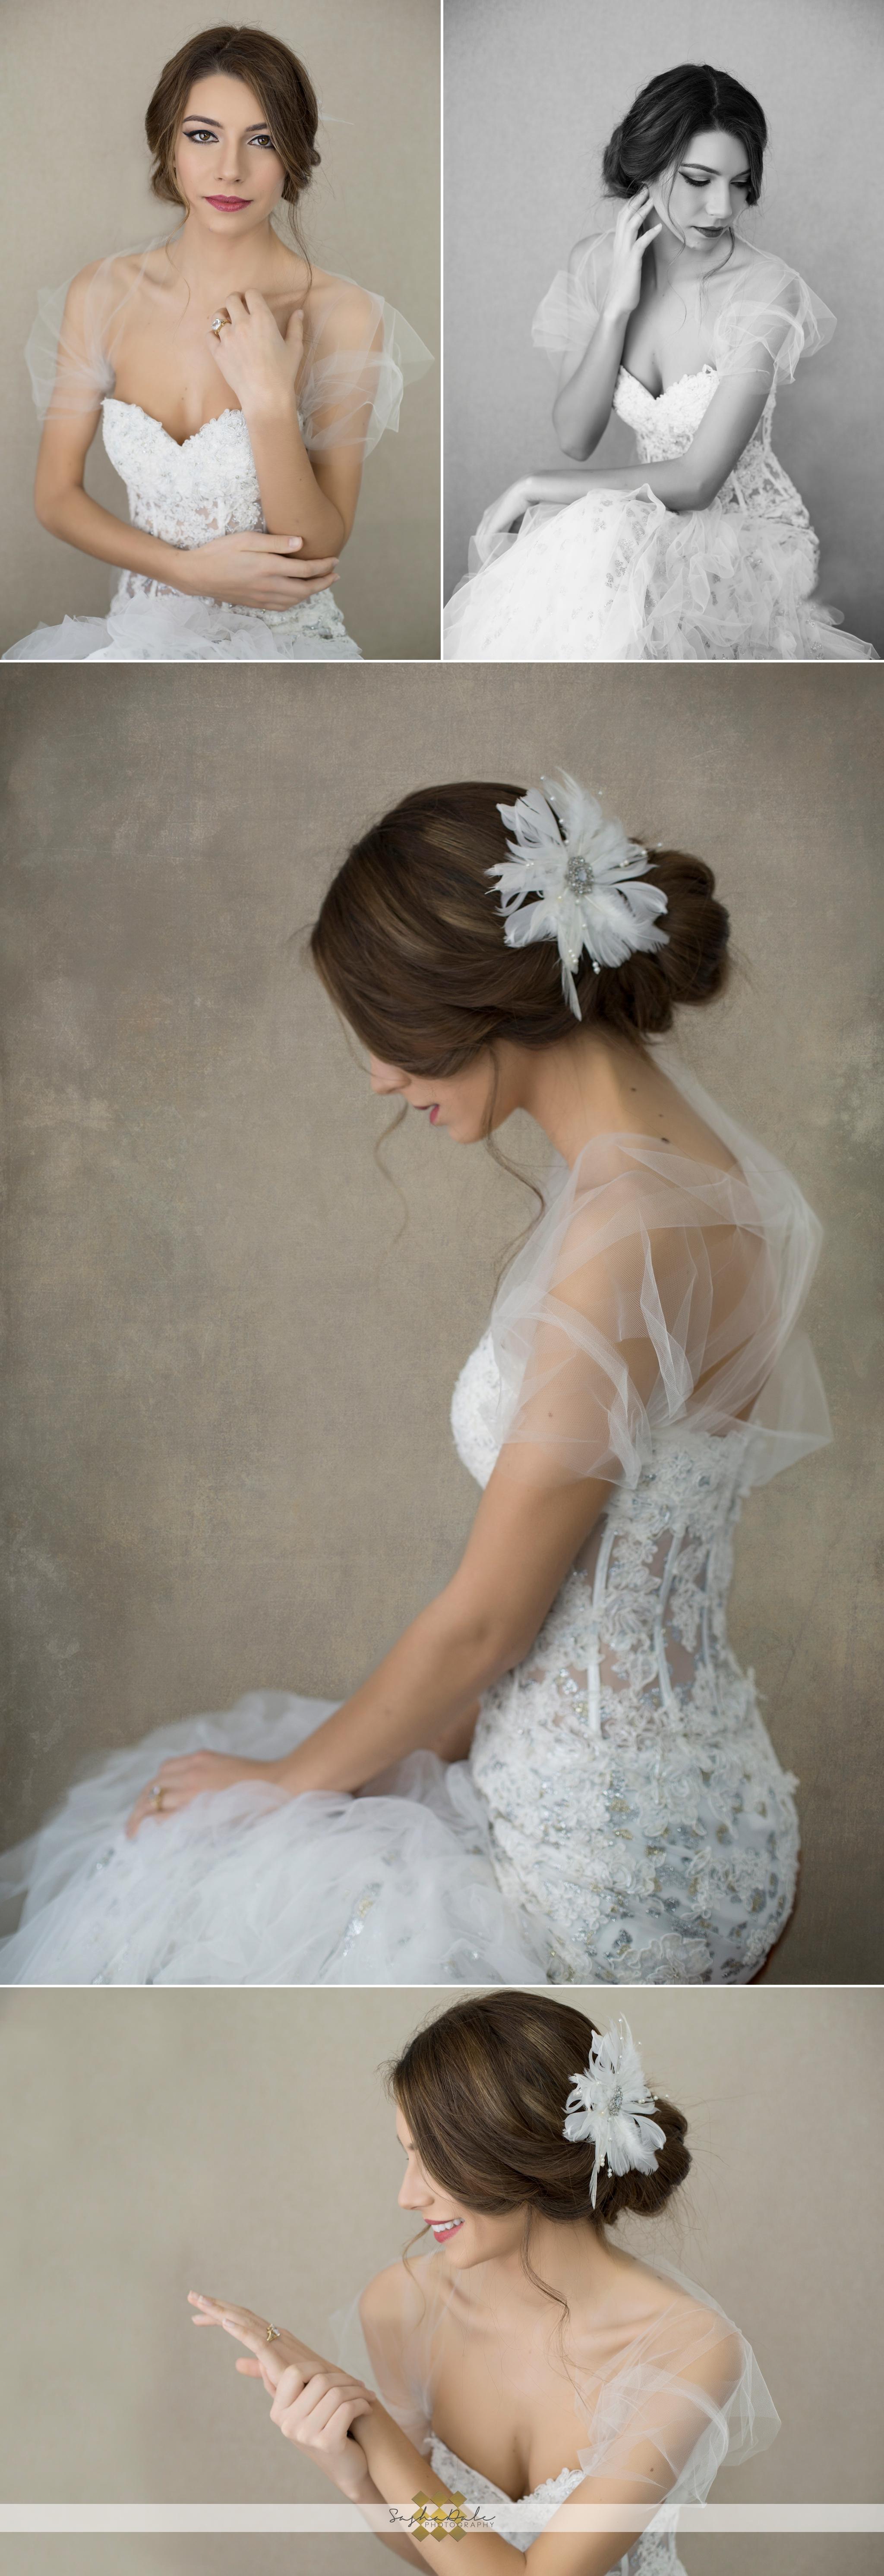 CT Bridal Portraits, Jovani Dress, White Dress, New Preston CT, Glamour, Beauty Portraits, CT Photographer